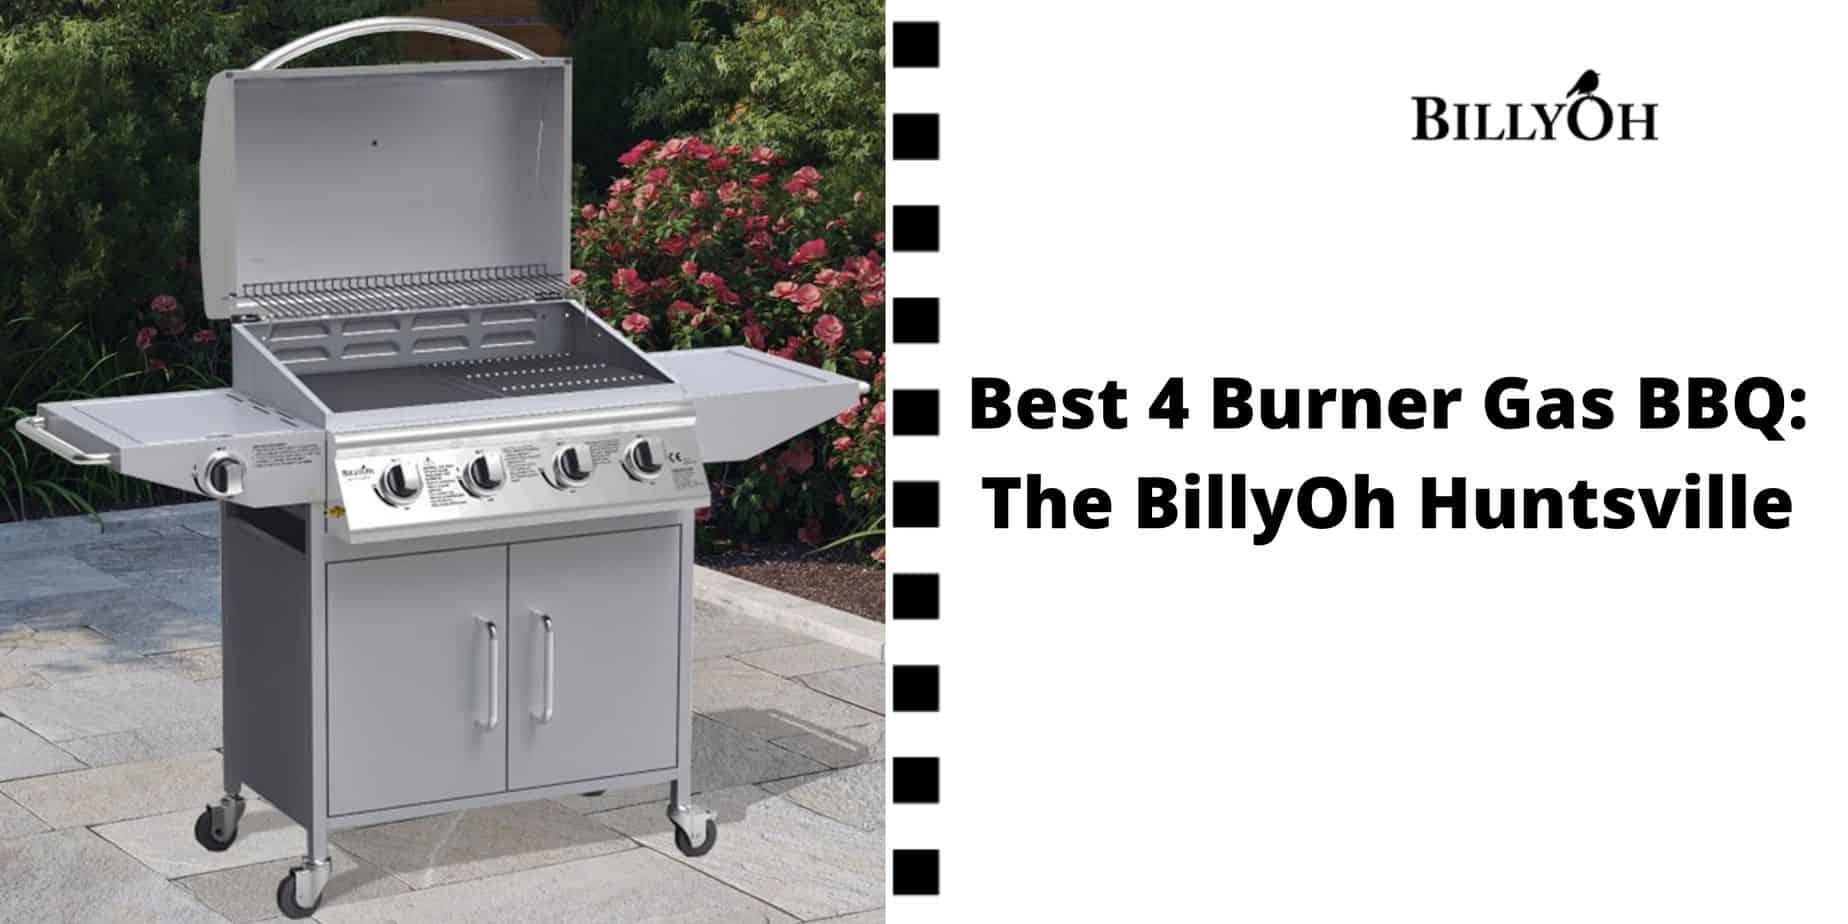 Best 4 burner gas BBQ BillyOh Huntsville